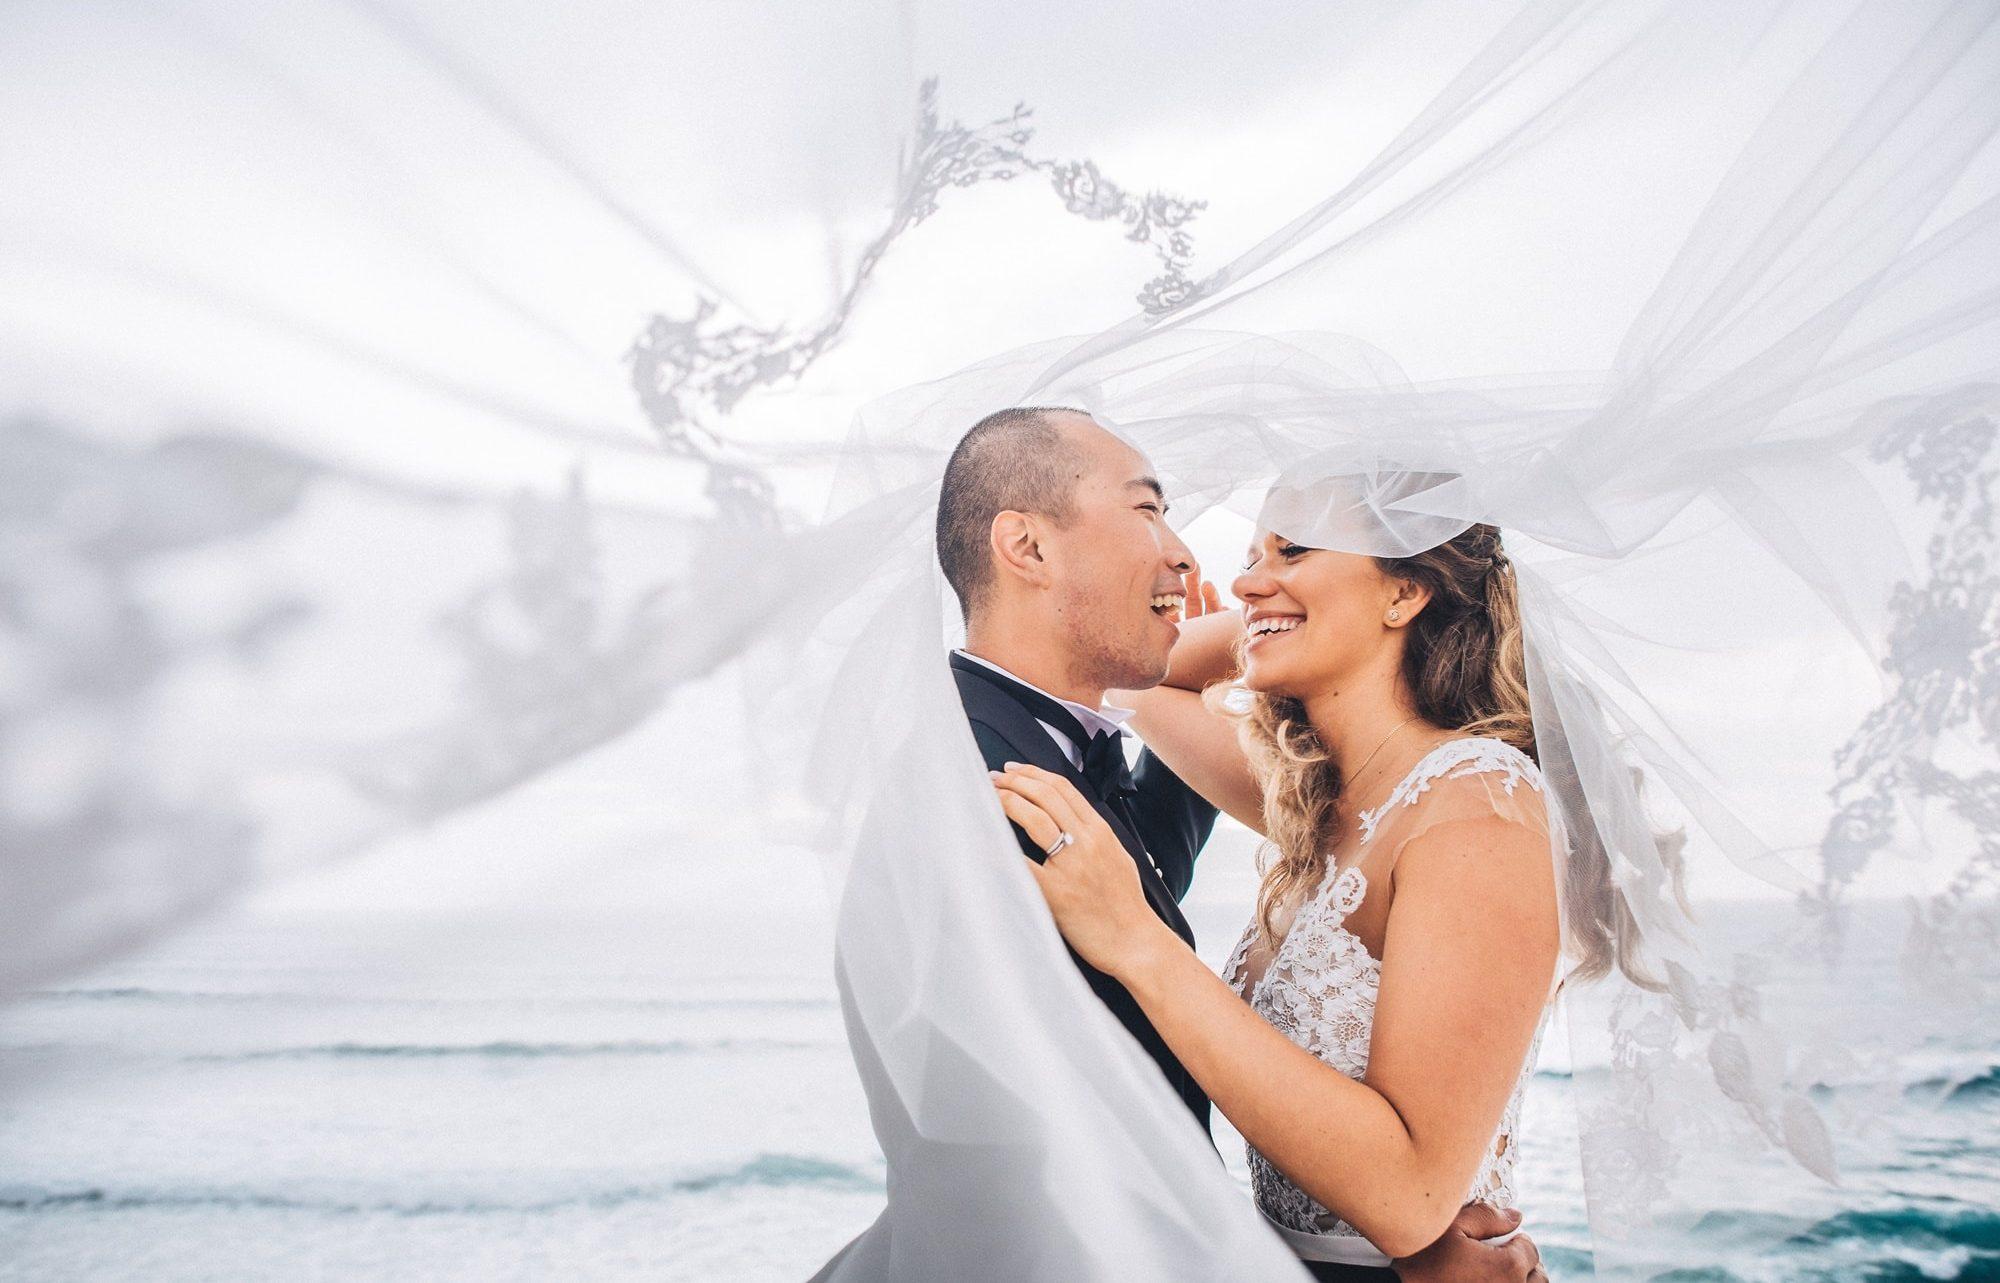 aguiam wedding photography-534-min